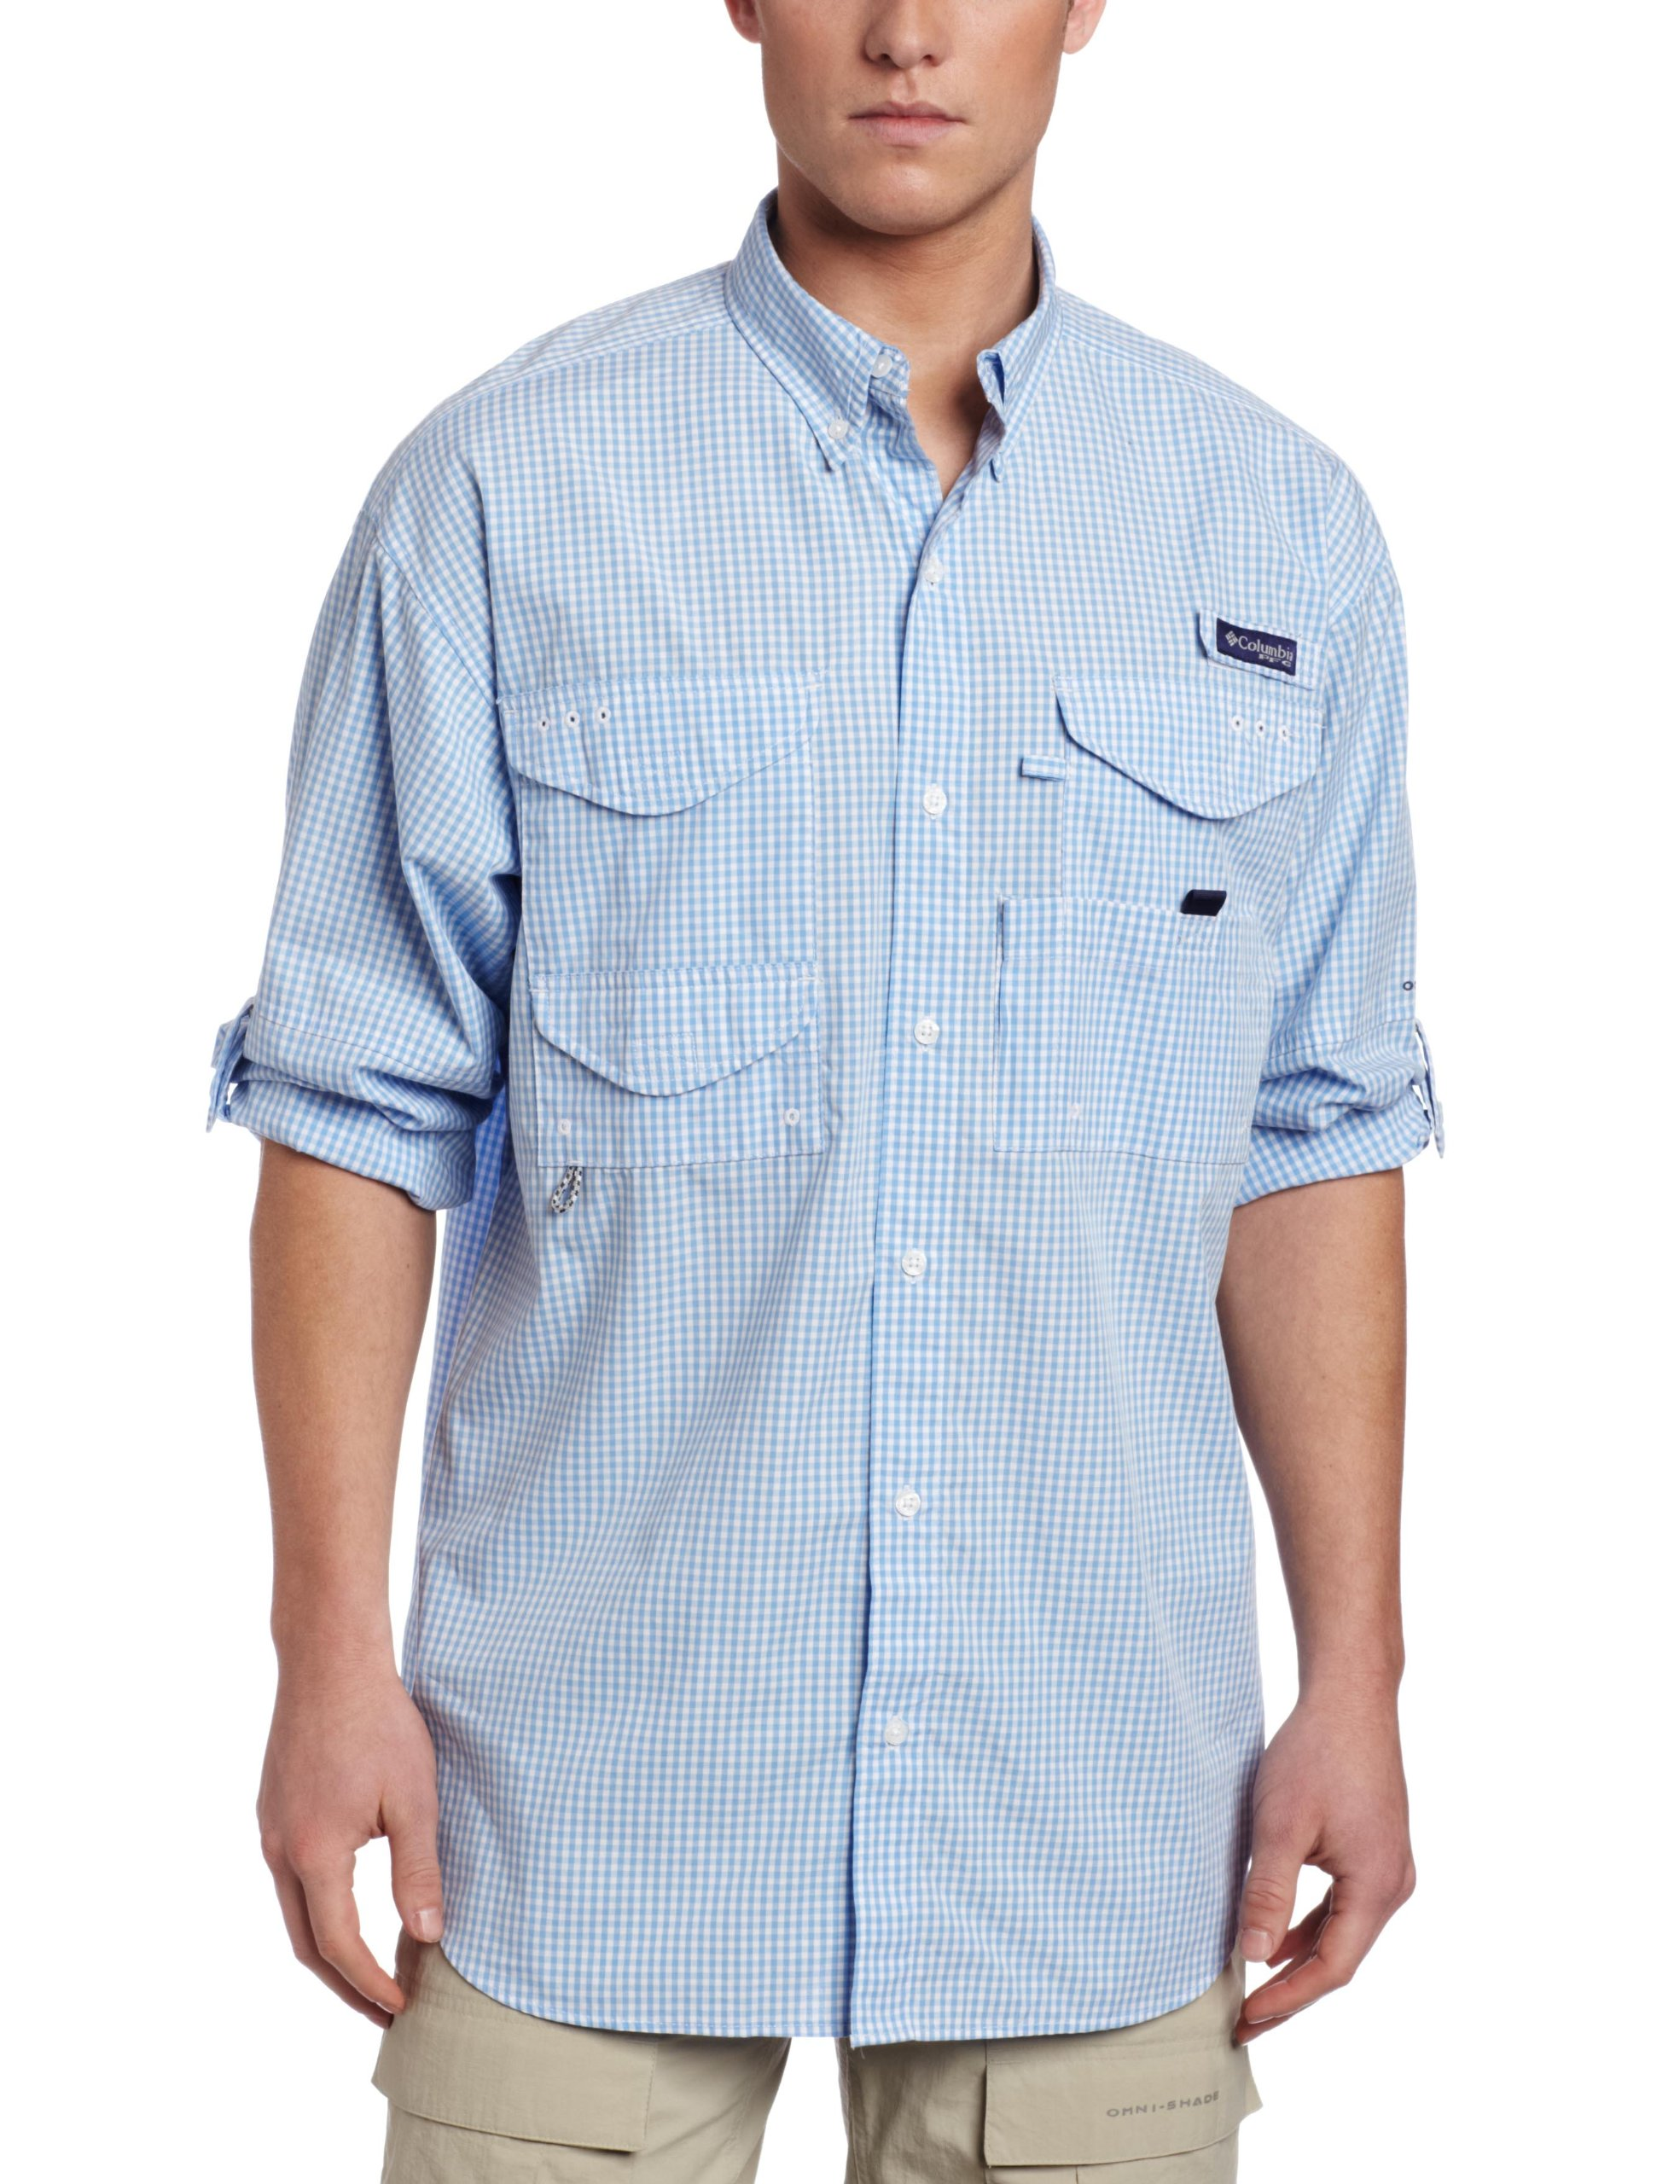 Columbia Men's Super Bonehead Classic Long Sleeve Shirt, Small, White Cap/Gingham by Columbia